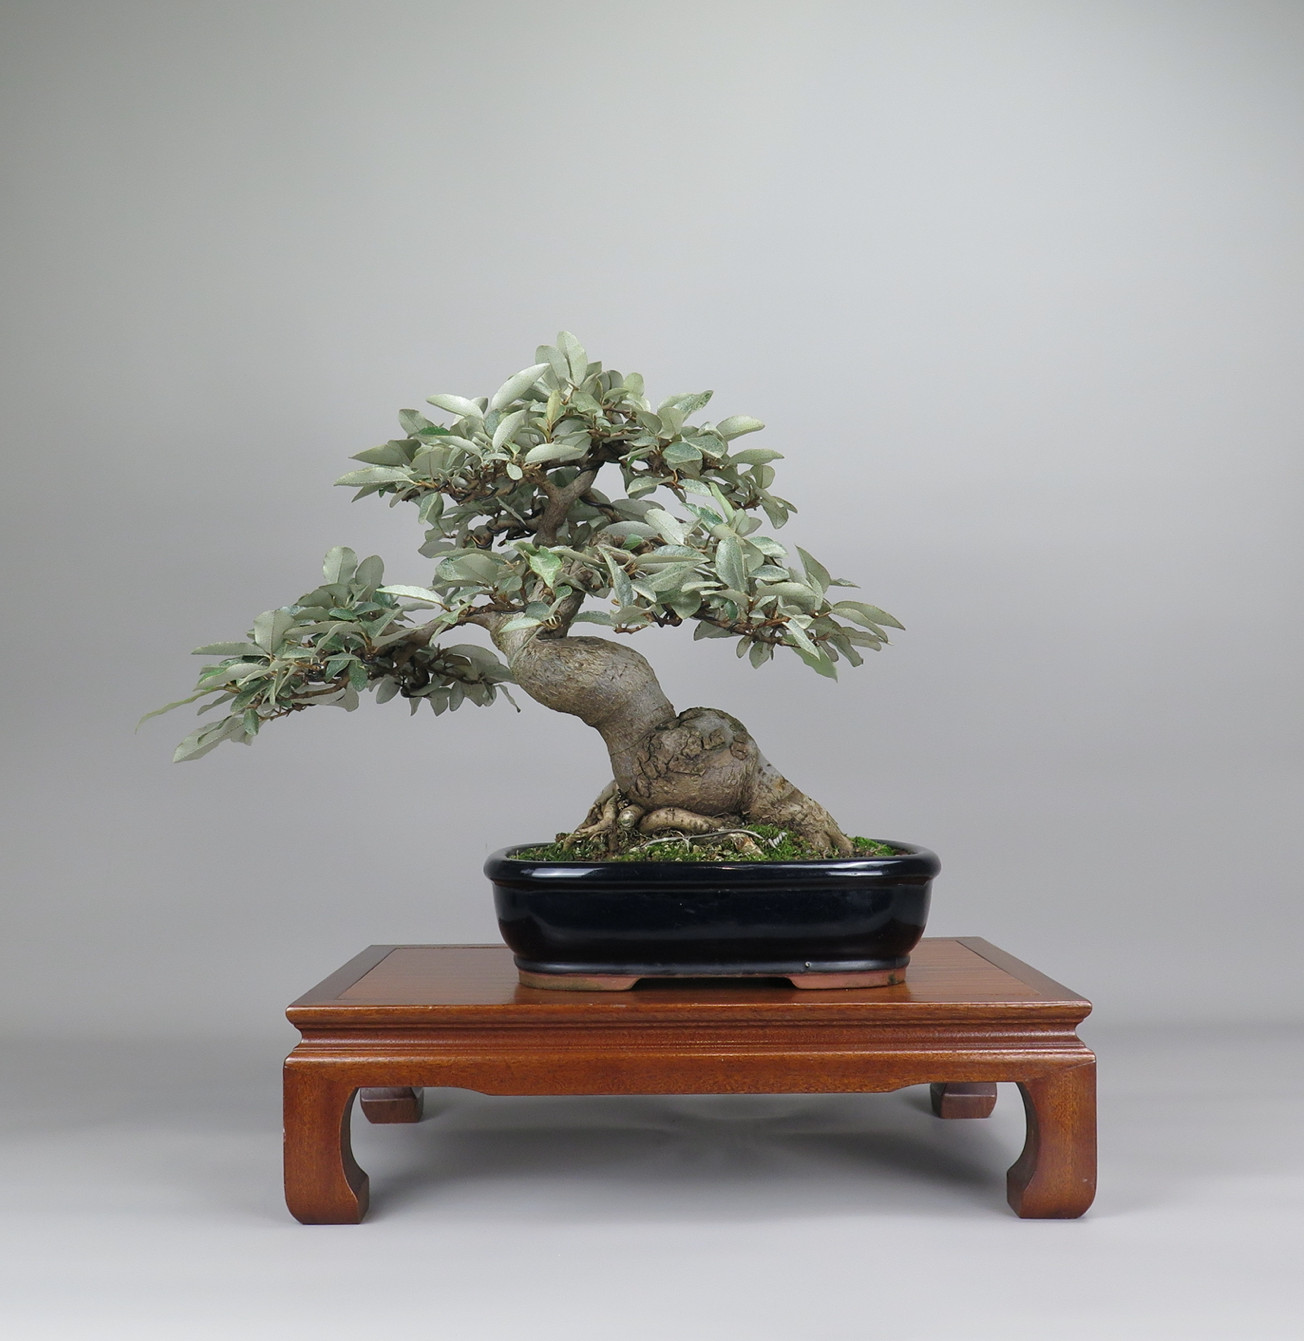 Bonsai de Eleagnus, espalda